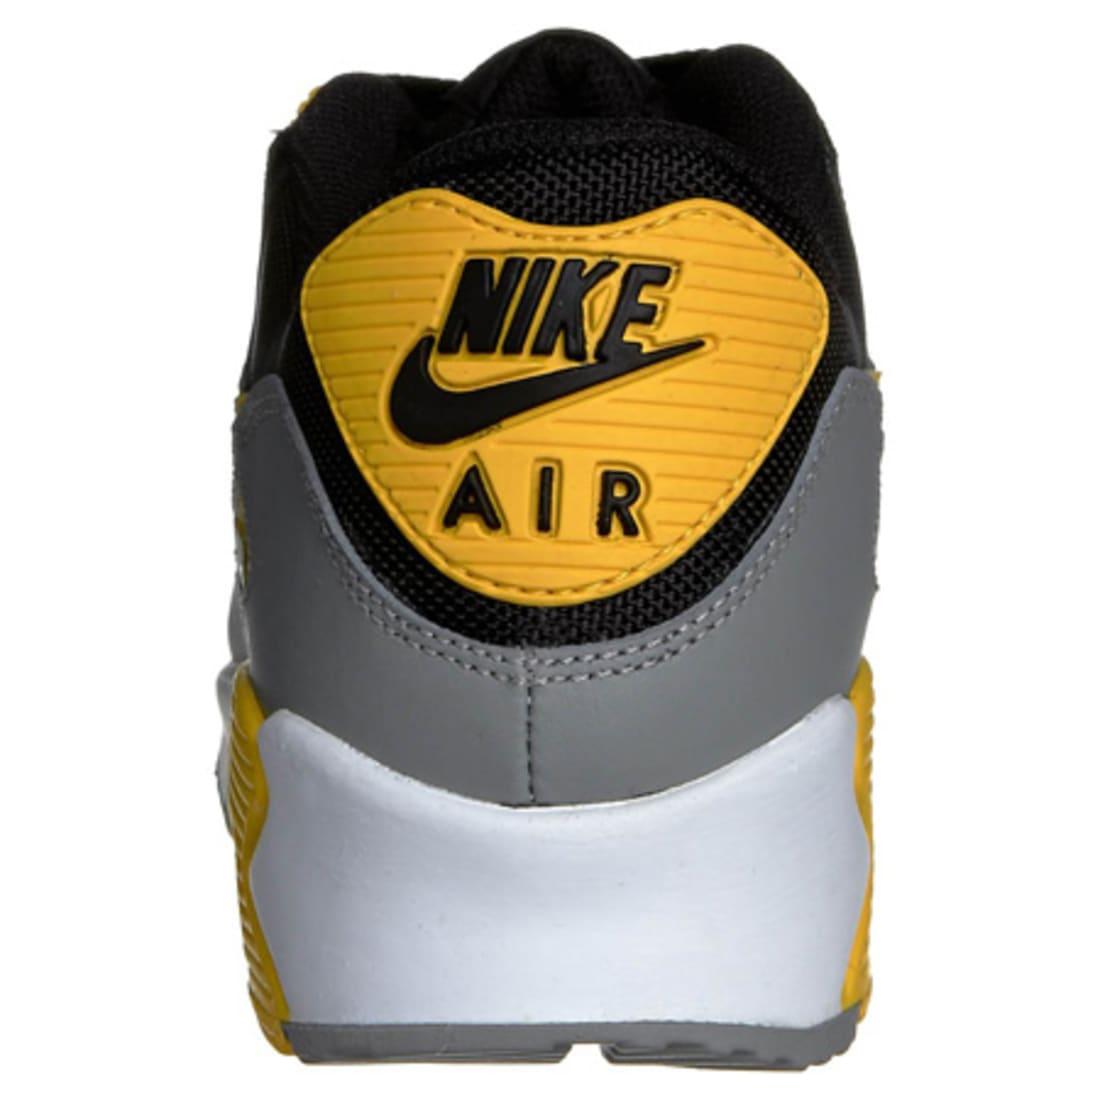 OLD N - Baskets Nike Air Max 90 Noir Gris Jaune ...